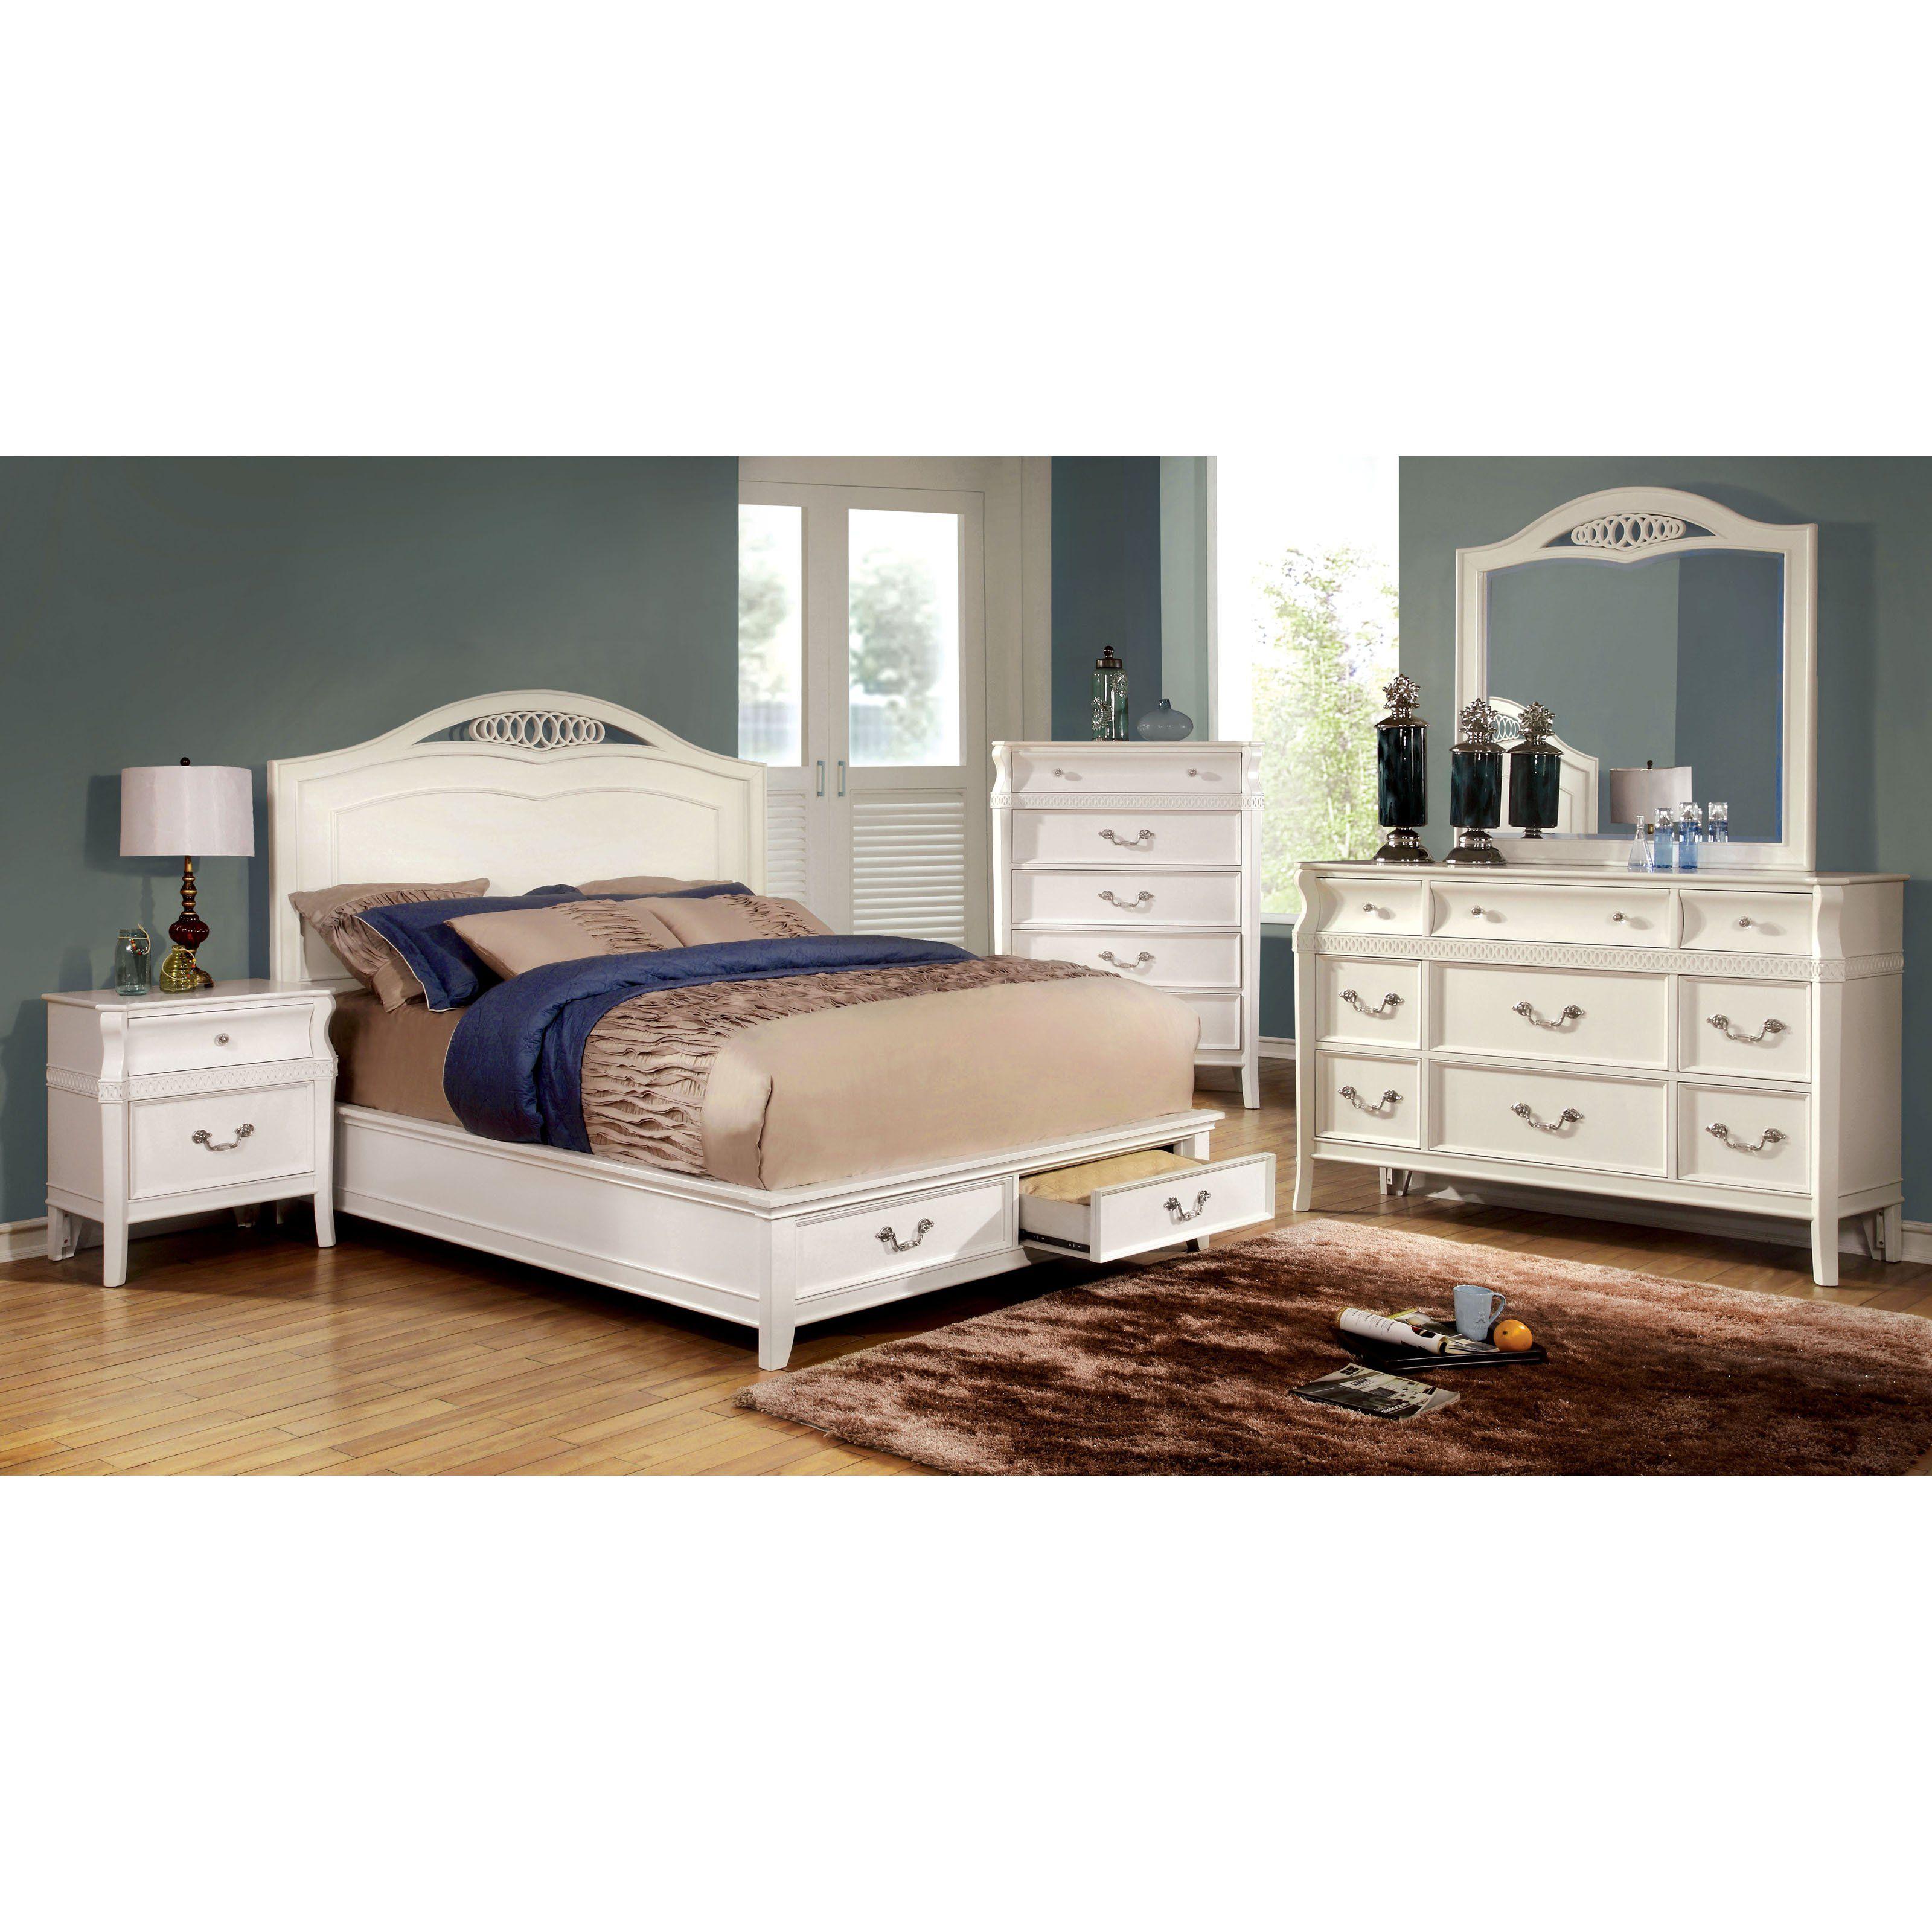 Room Furniture of America Troxler Storage Panel